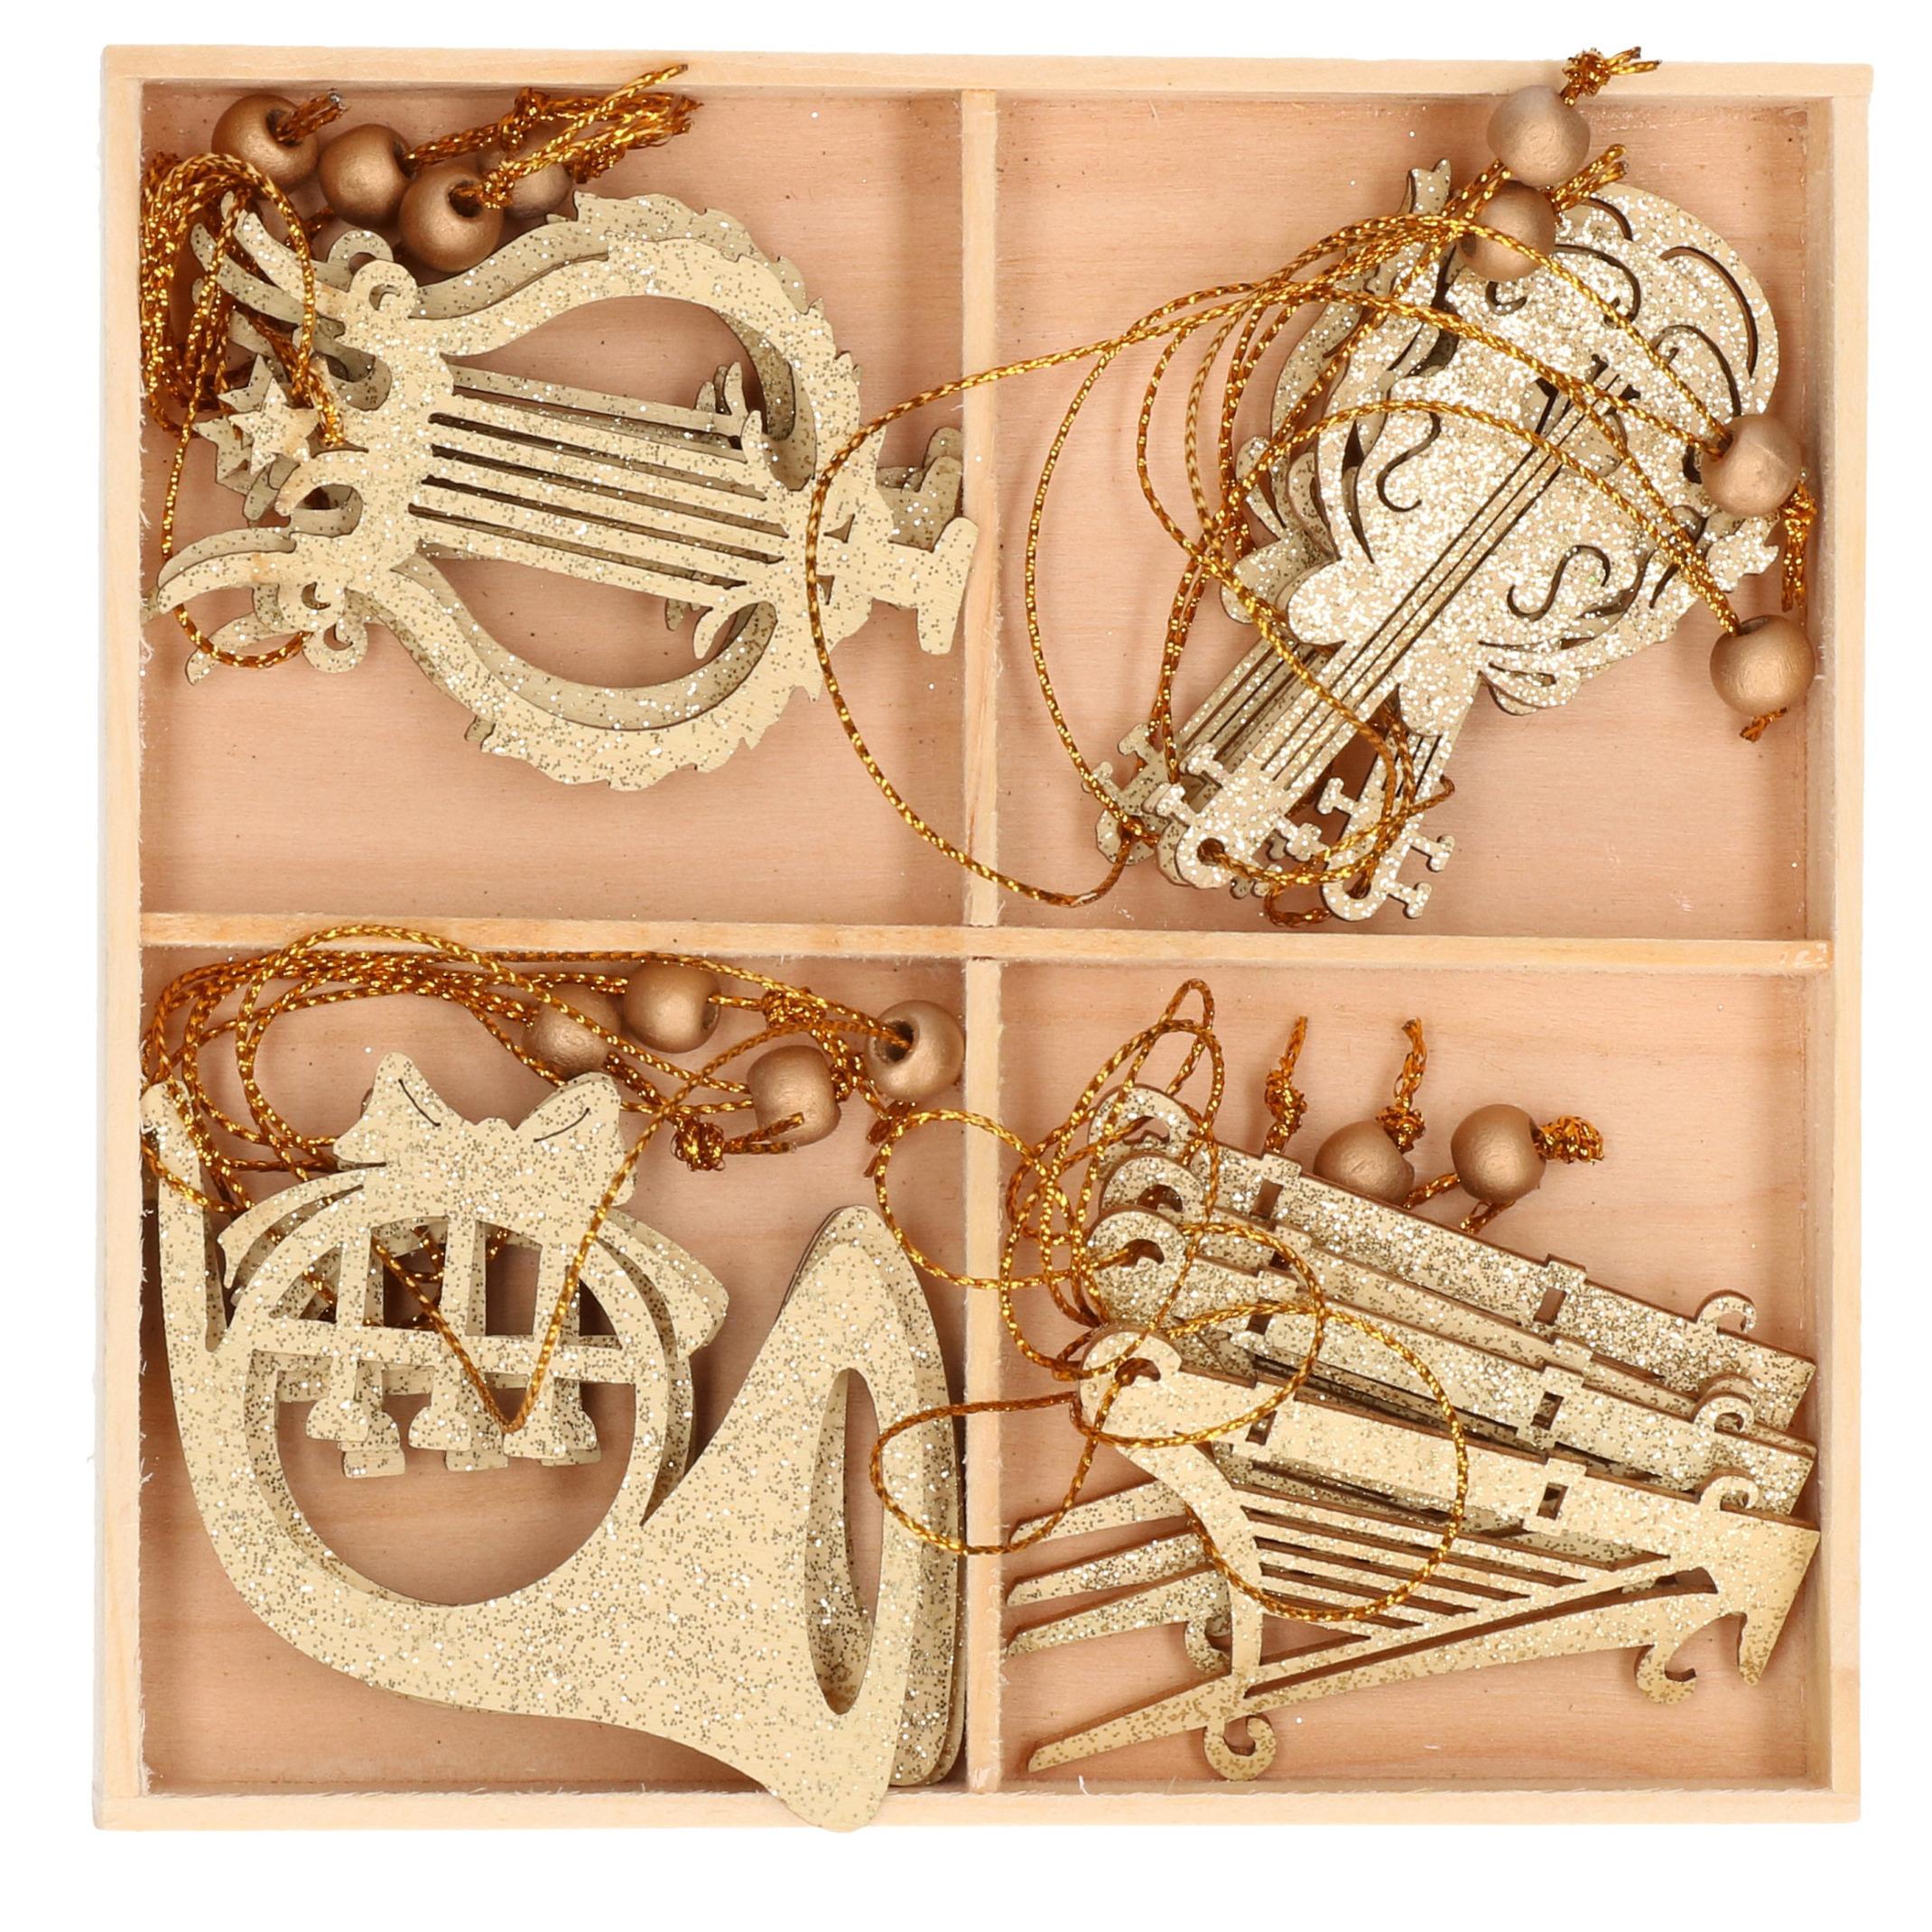 16x Houten kersthangers muziekinstrumenten ornamenten goud 6-7 cm